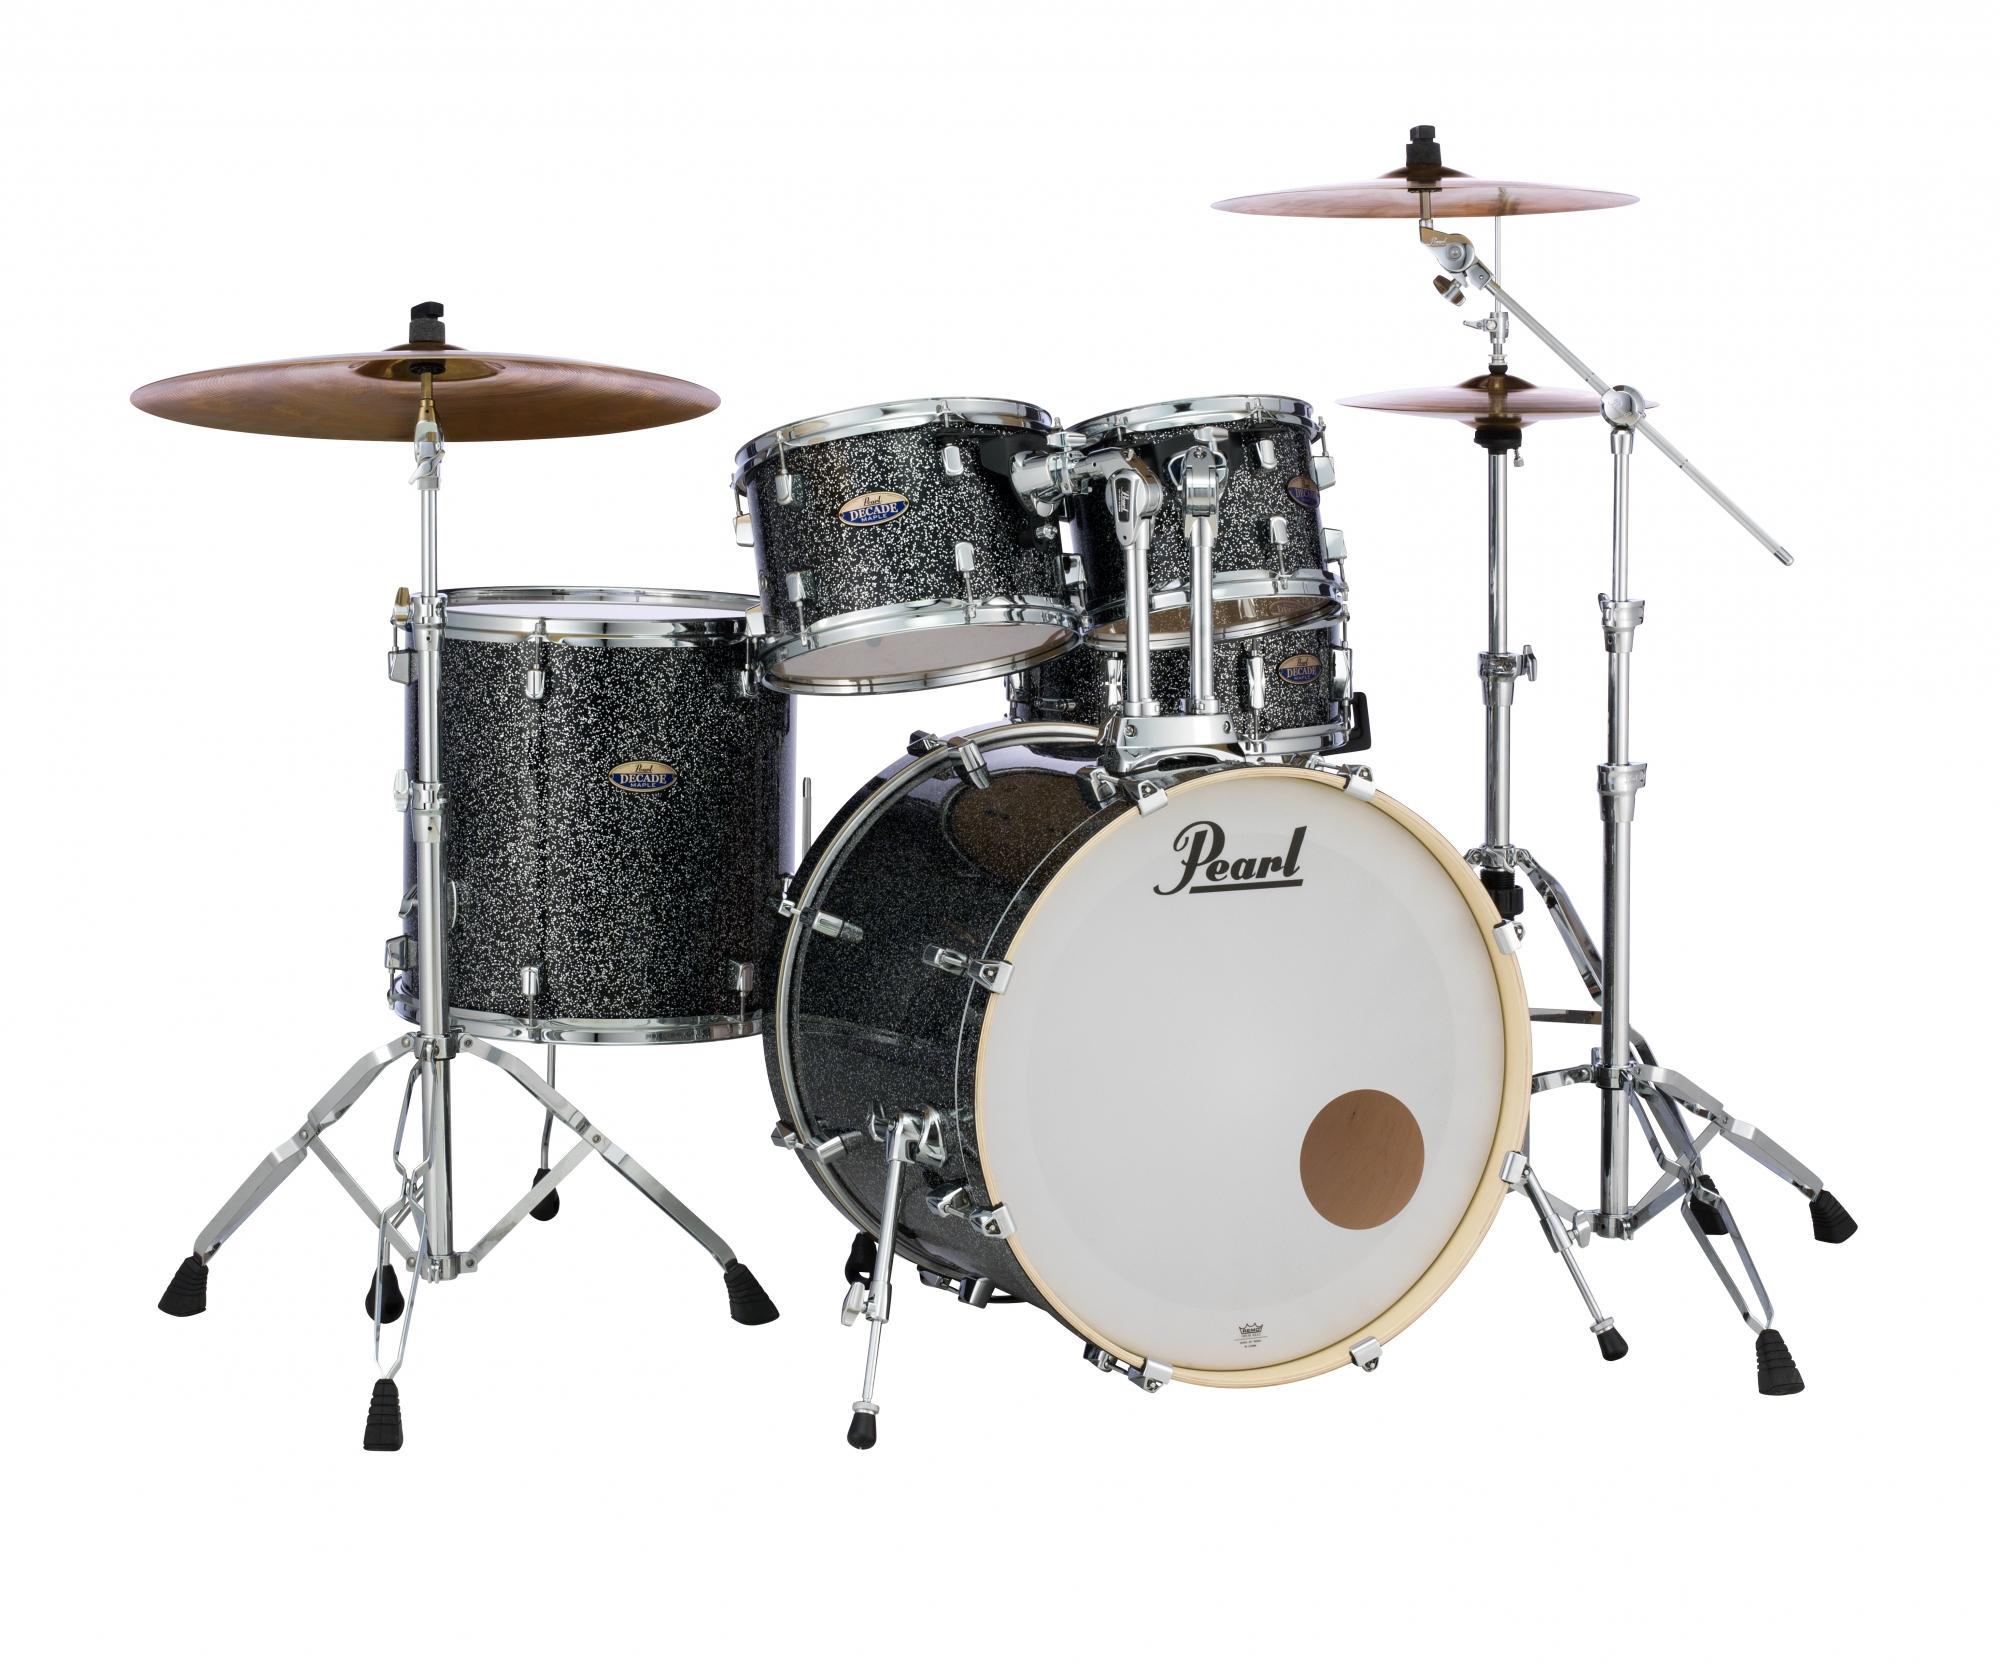 Billede af Pearl Decade Maple Standard Trommesæt Slate Galaxy Flake